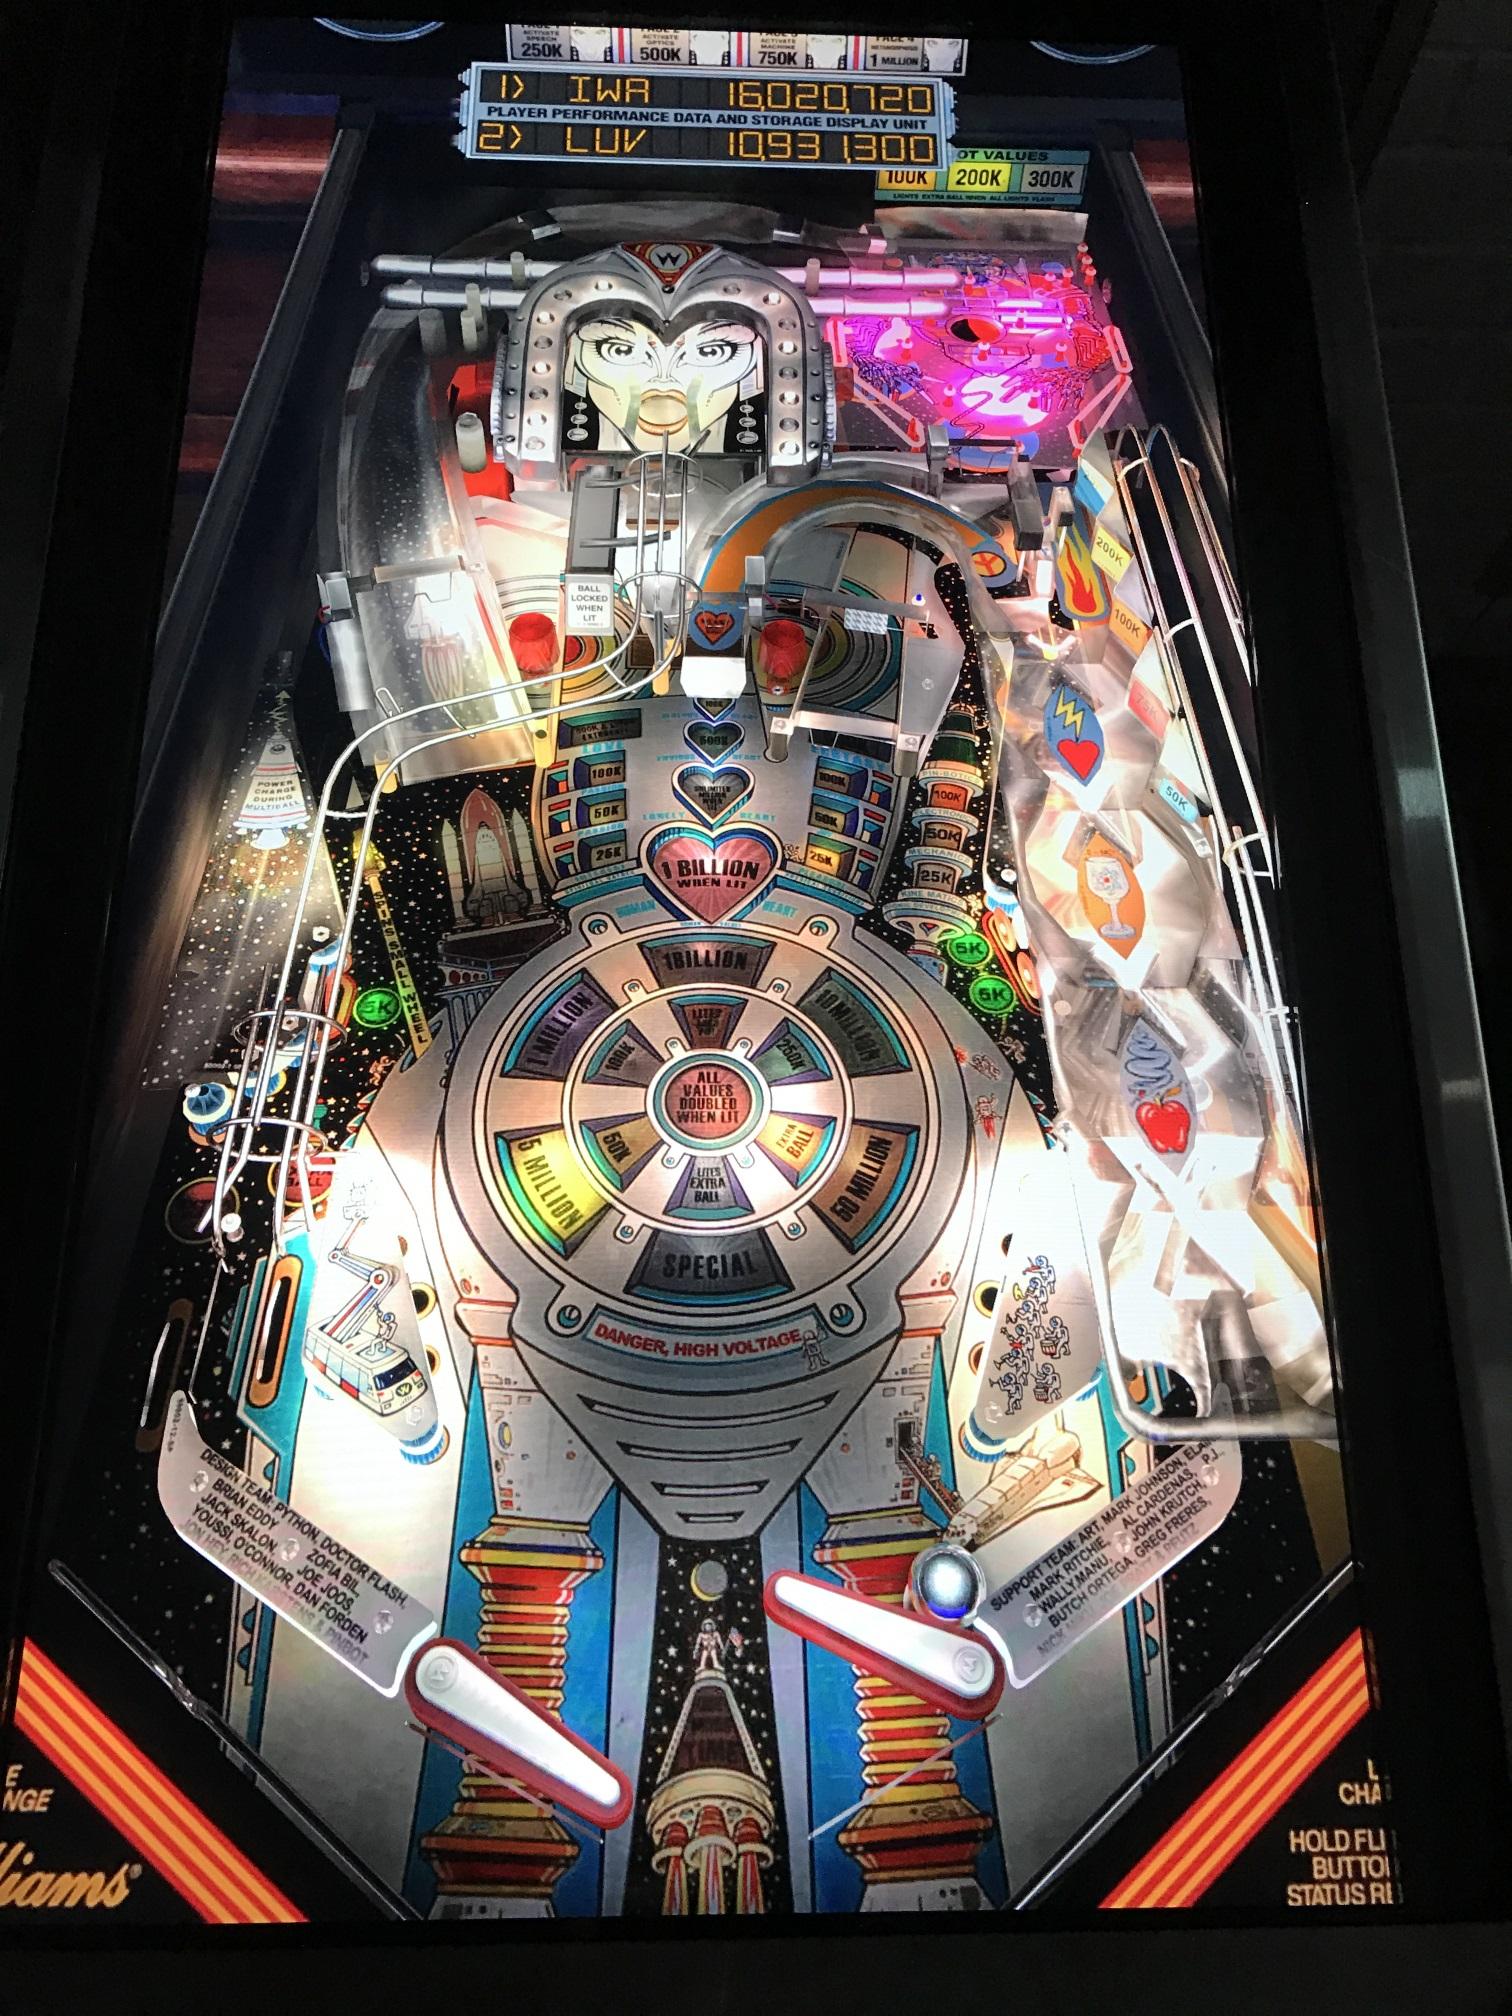 Your Digital Pinball Machine - virtuapin mini playfield - Your Digital Pinball Machine